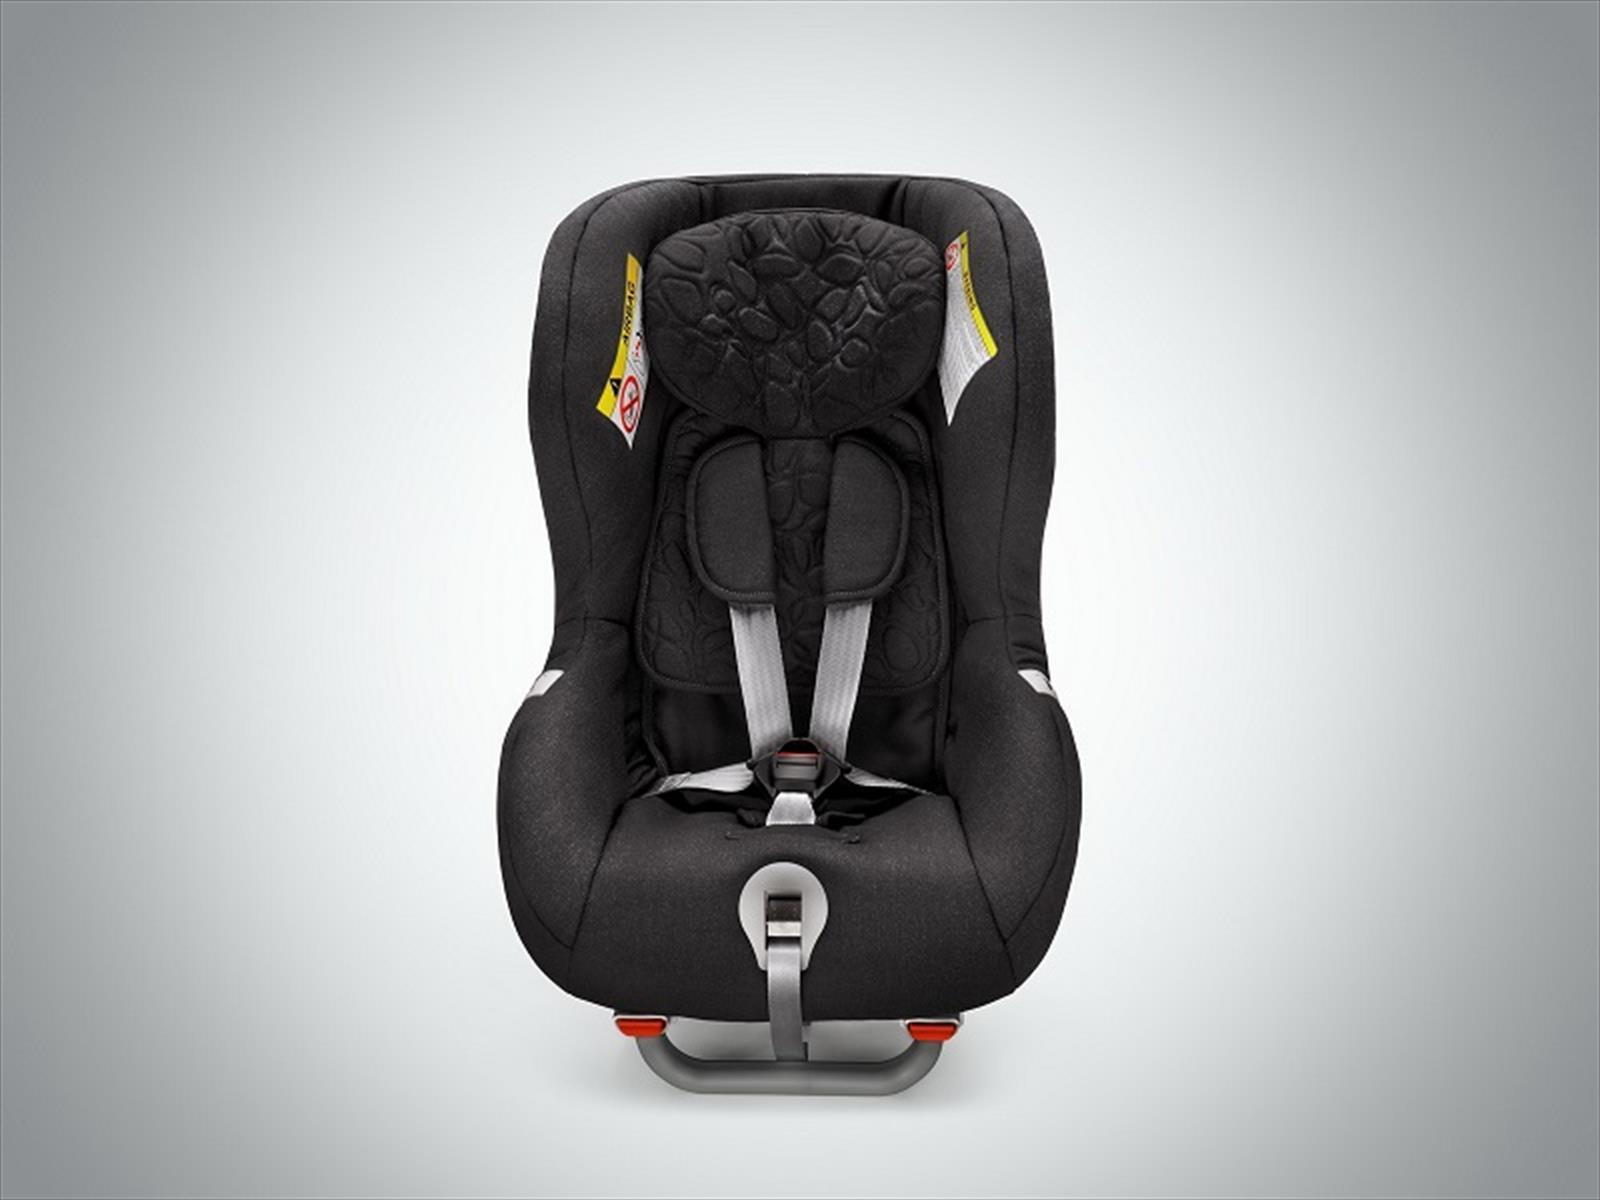 Auto asientos para ni os de volvo for Asiento para ninos auto